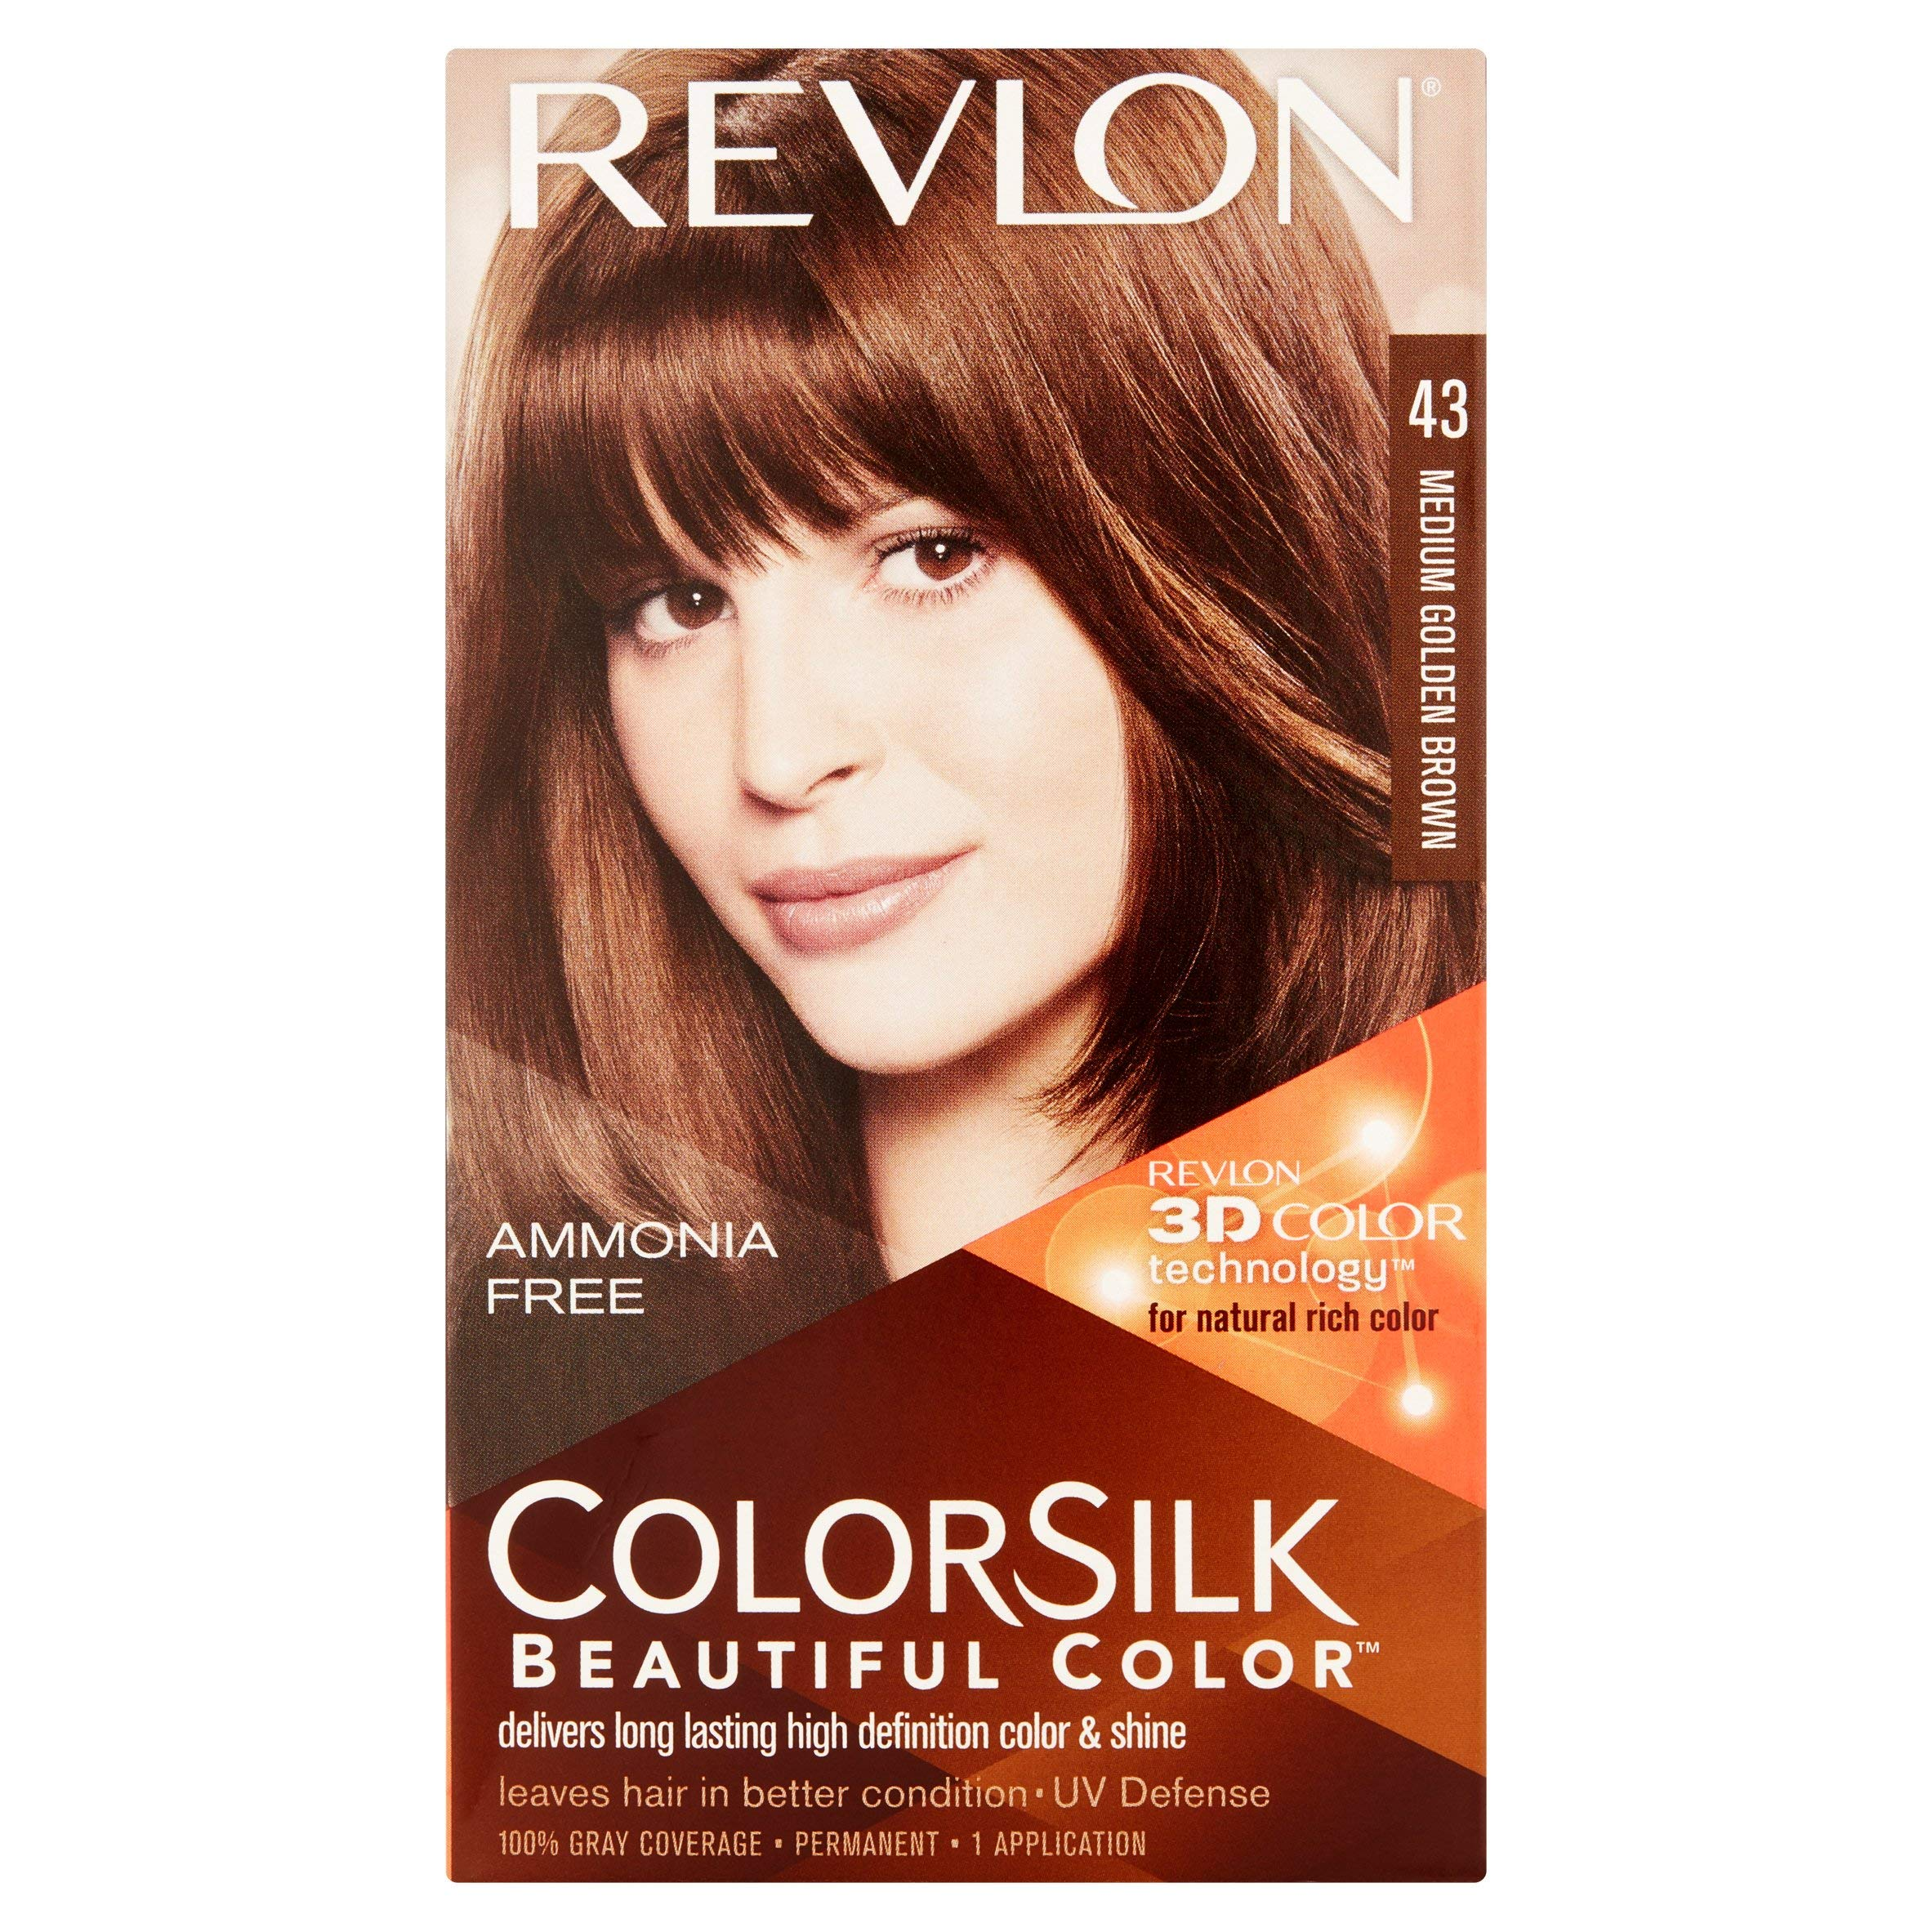 Revlon ColorSilk Hair Color [43] Medium Golden Brown 1 ea (Pack of 8) by Revlon